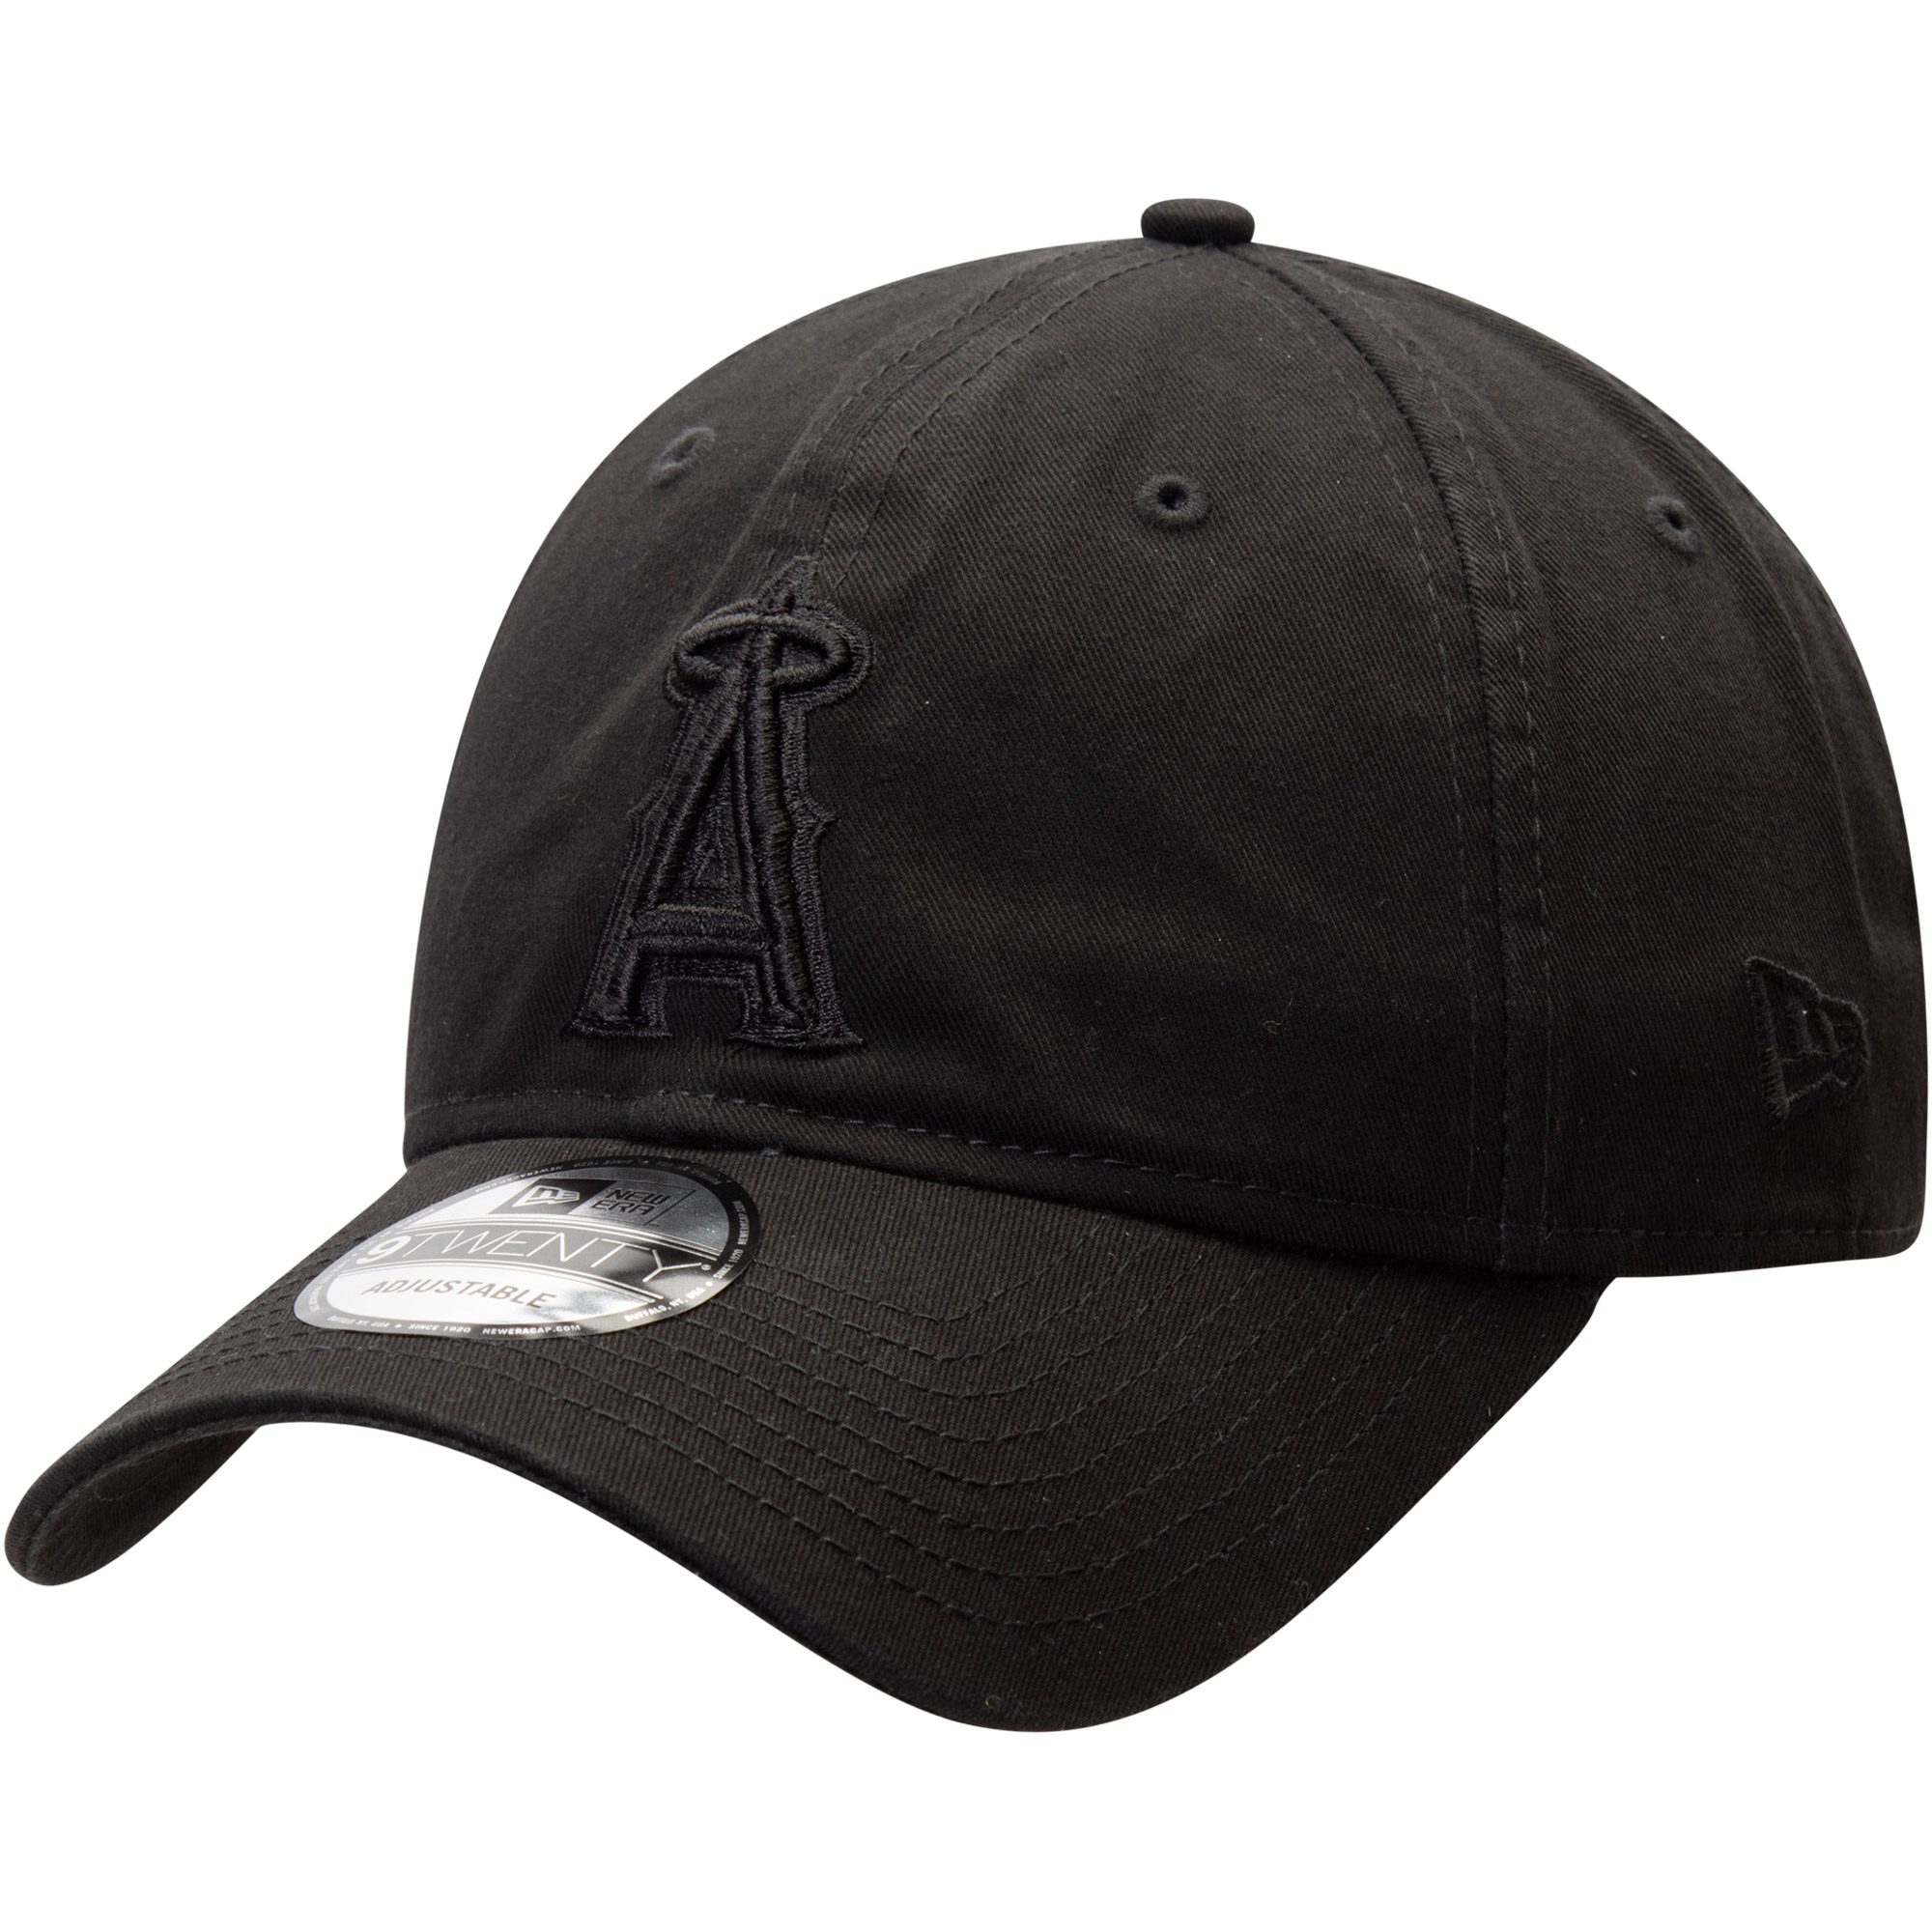 Los Angeles Angels New Era Team Tonal Core Classic 9TWENTY Adjustable Hat - Black - OSFA